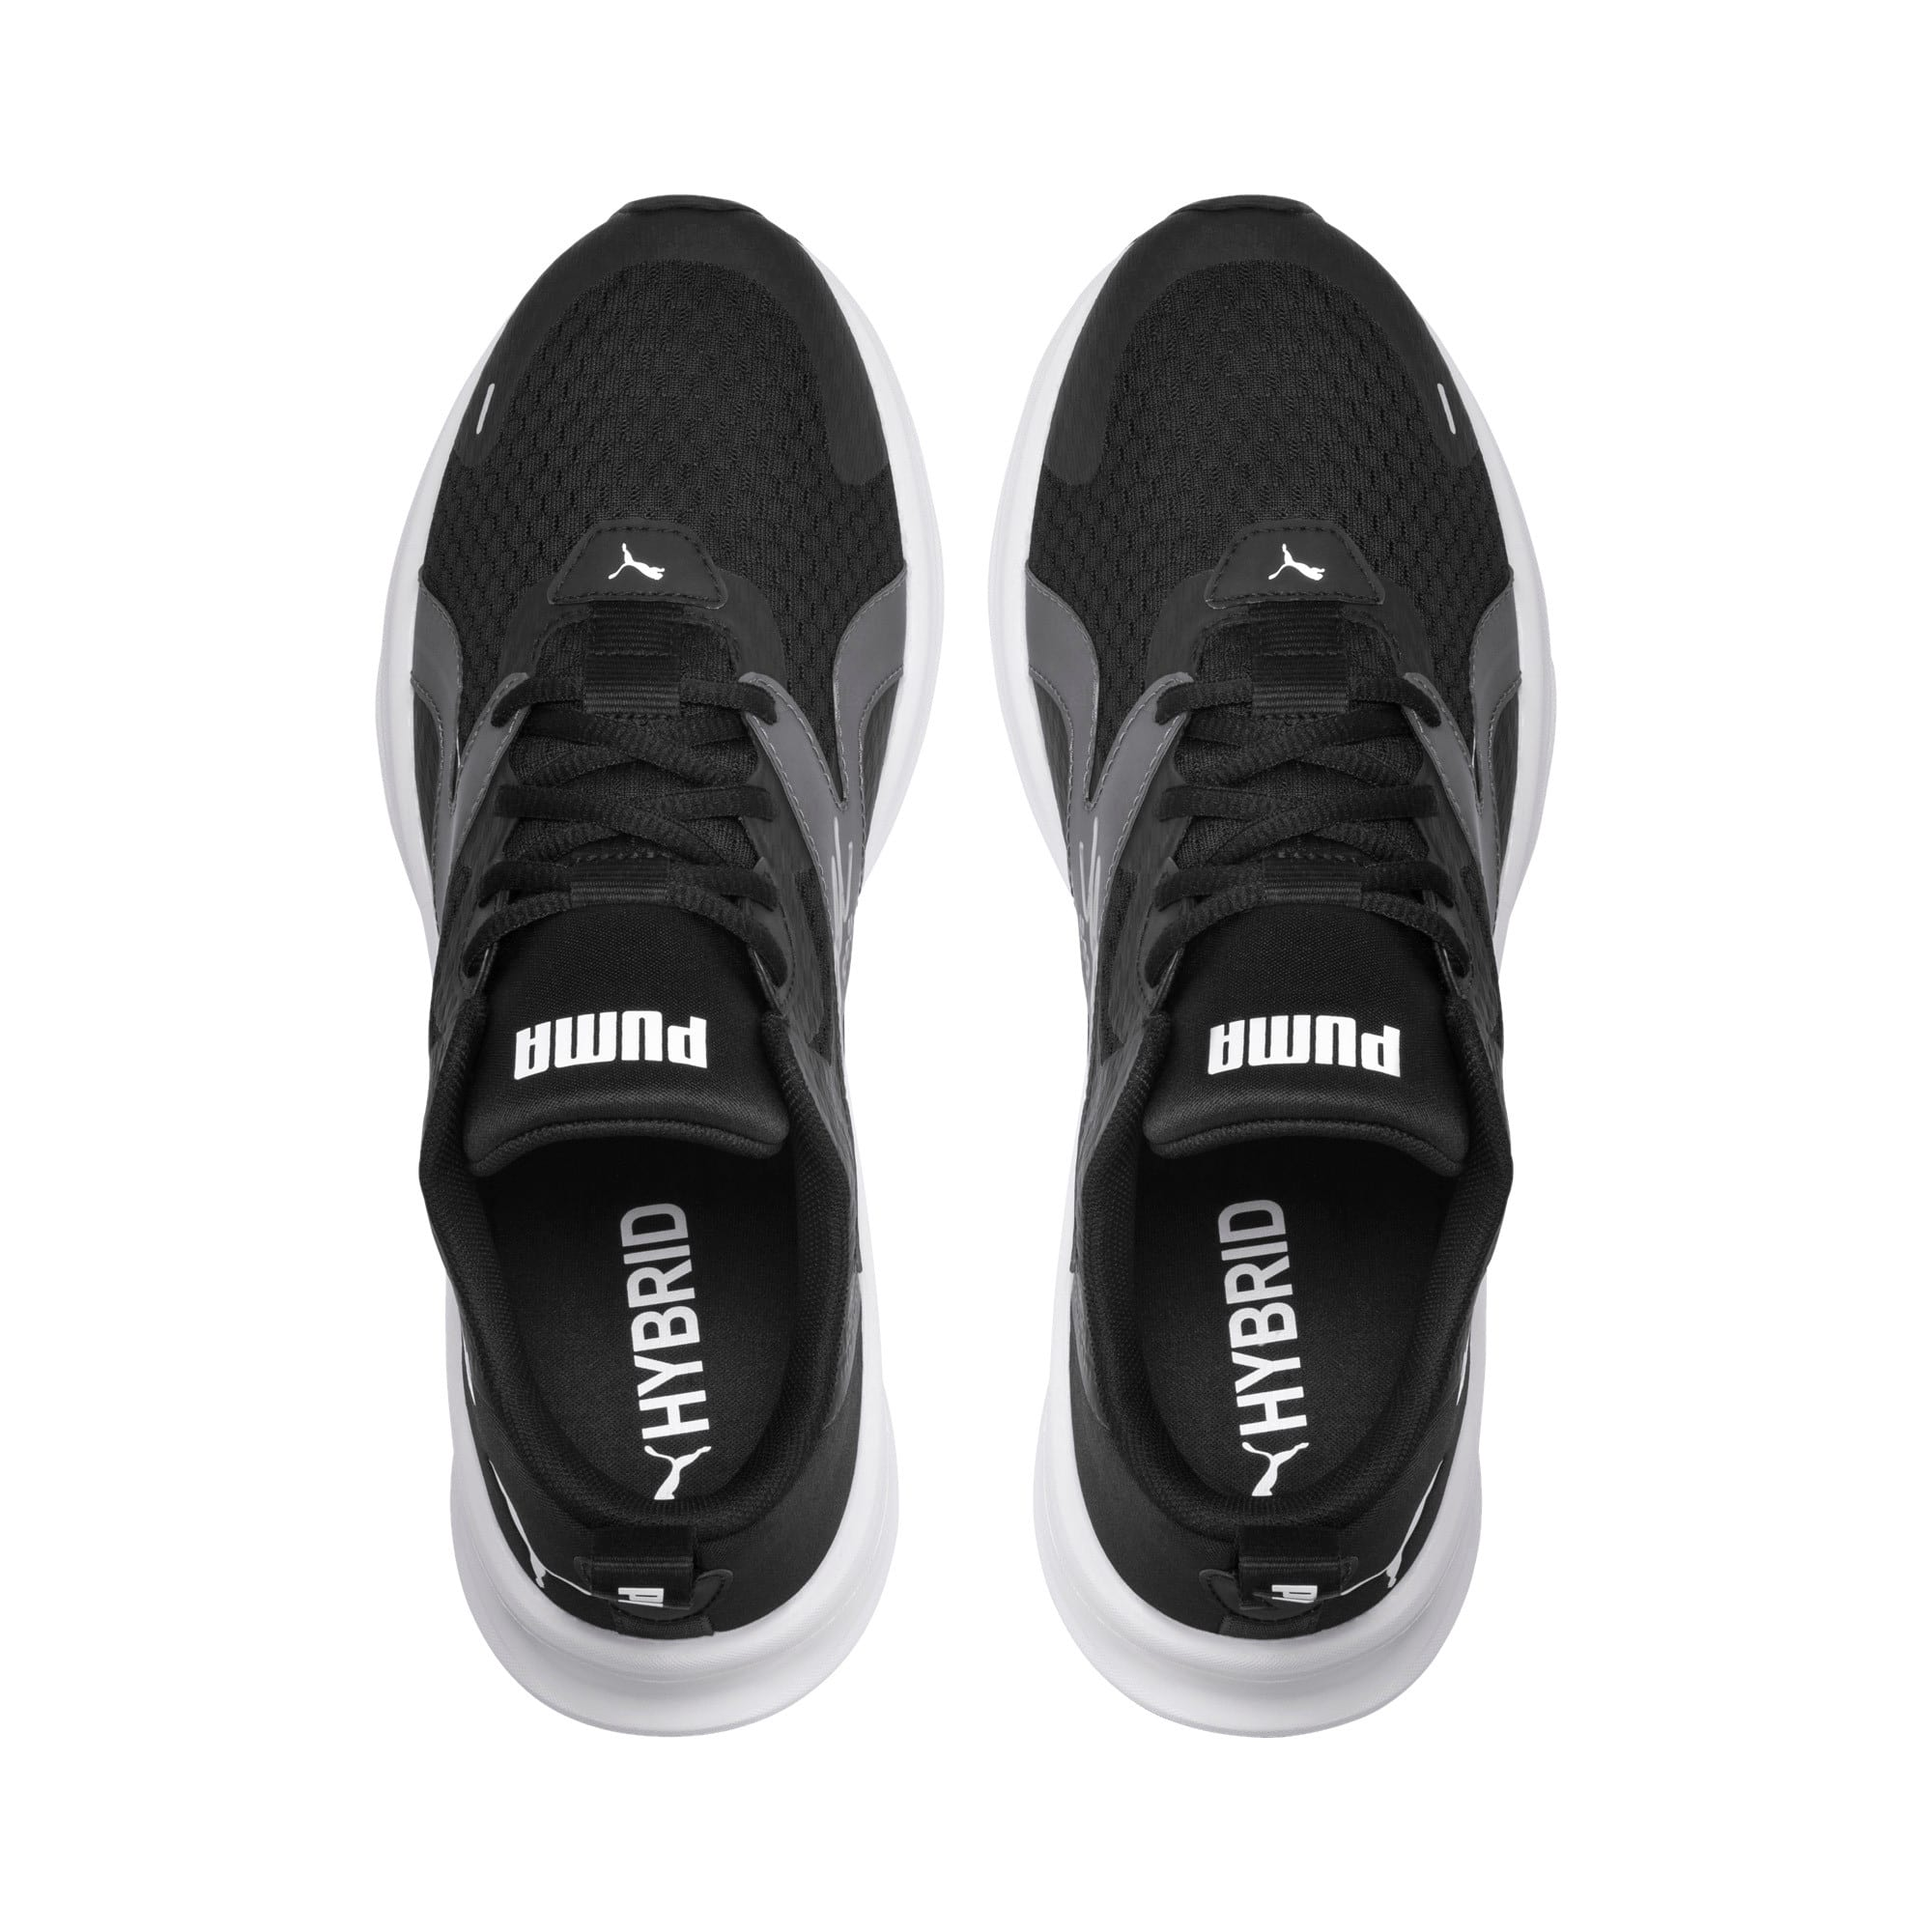 Thumbnail 7 of HYBRID Fuego Men's Running Shoes, Puma Black-Puma White, medium